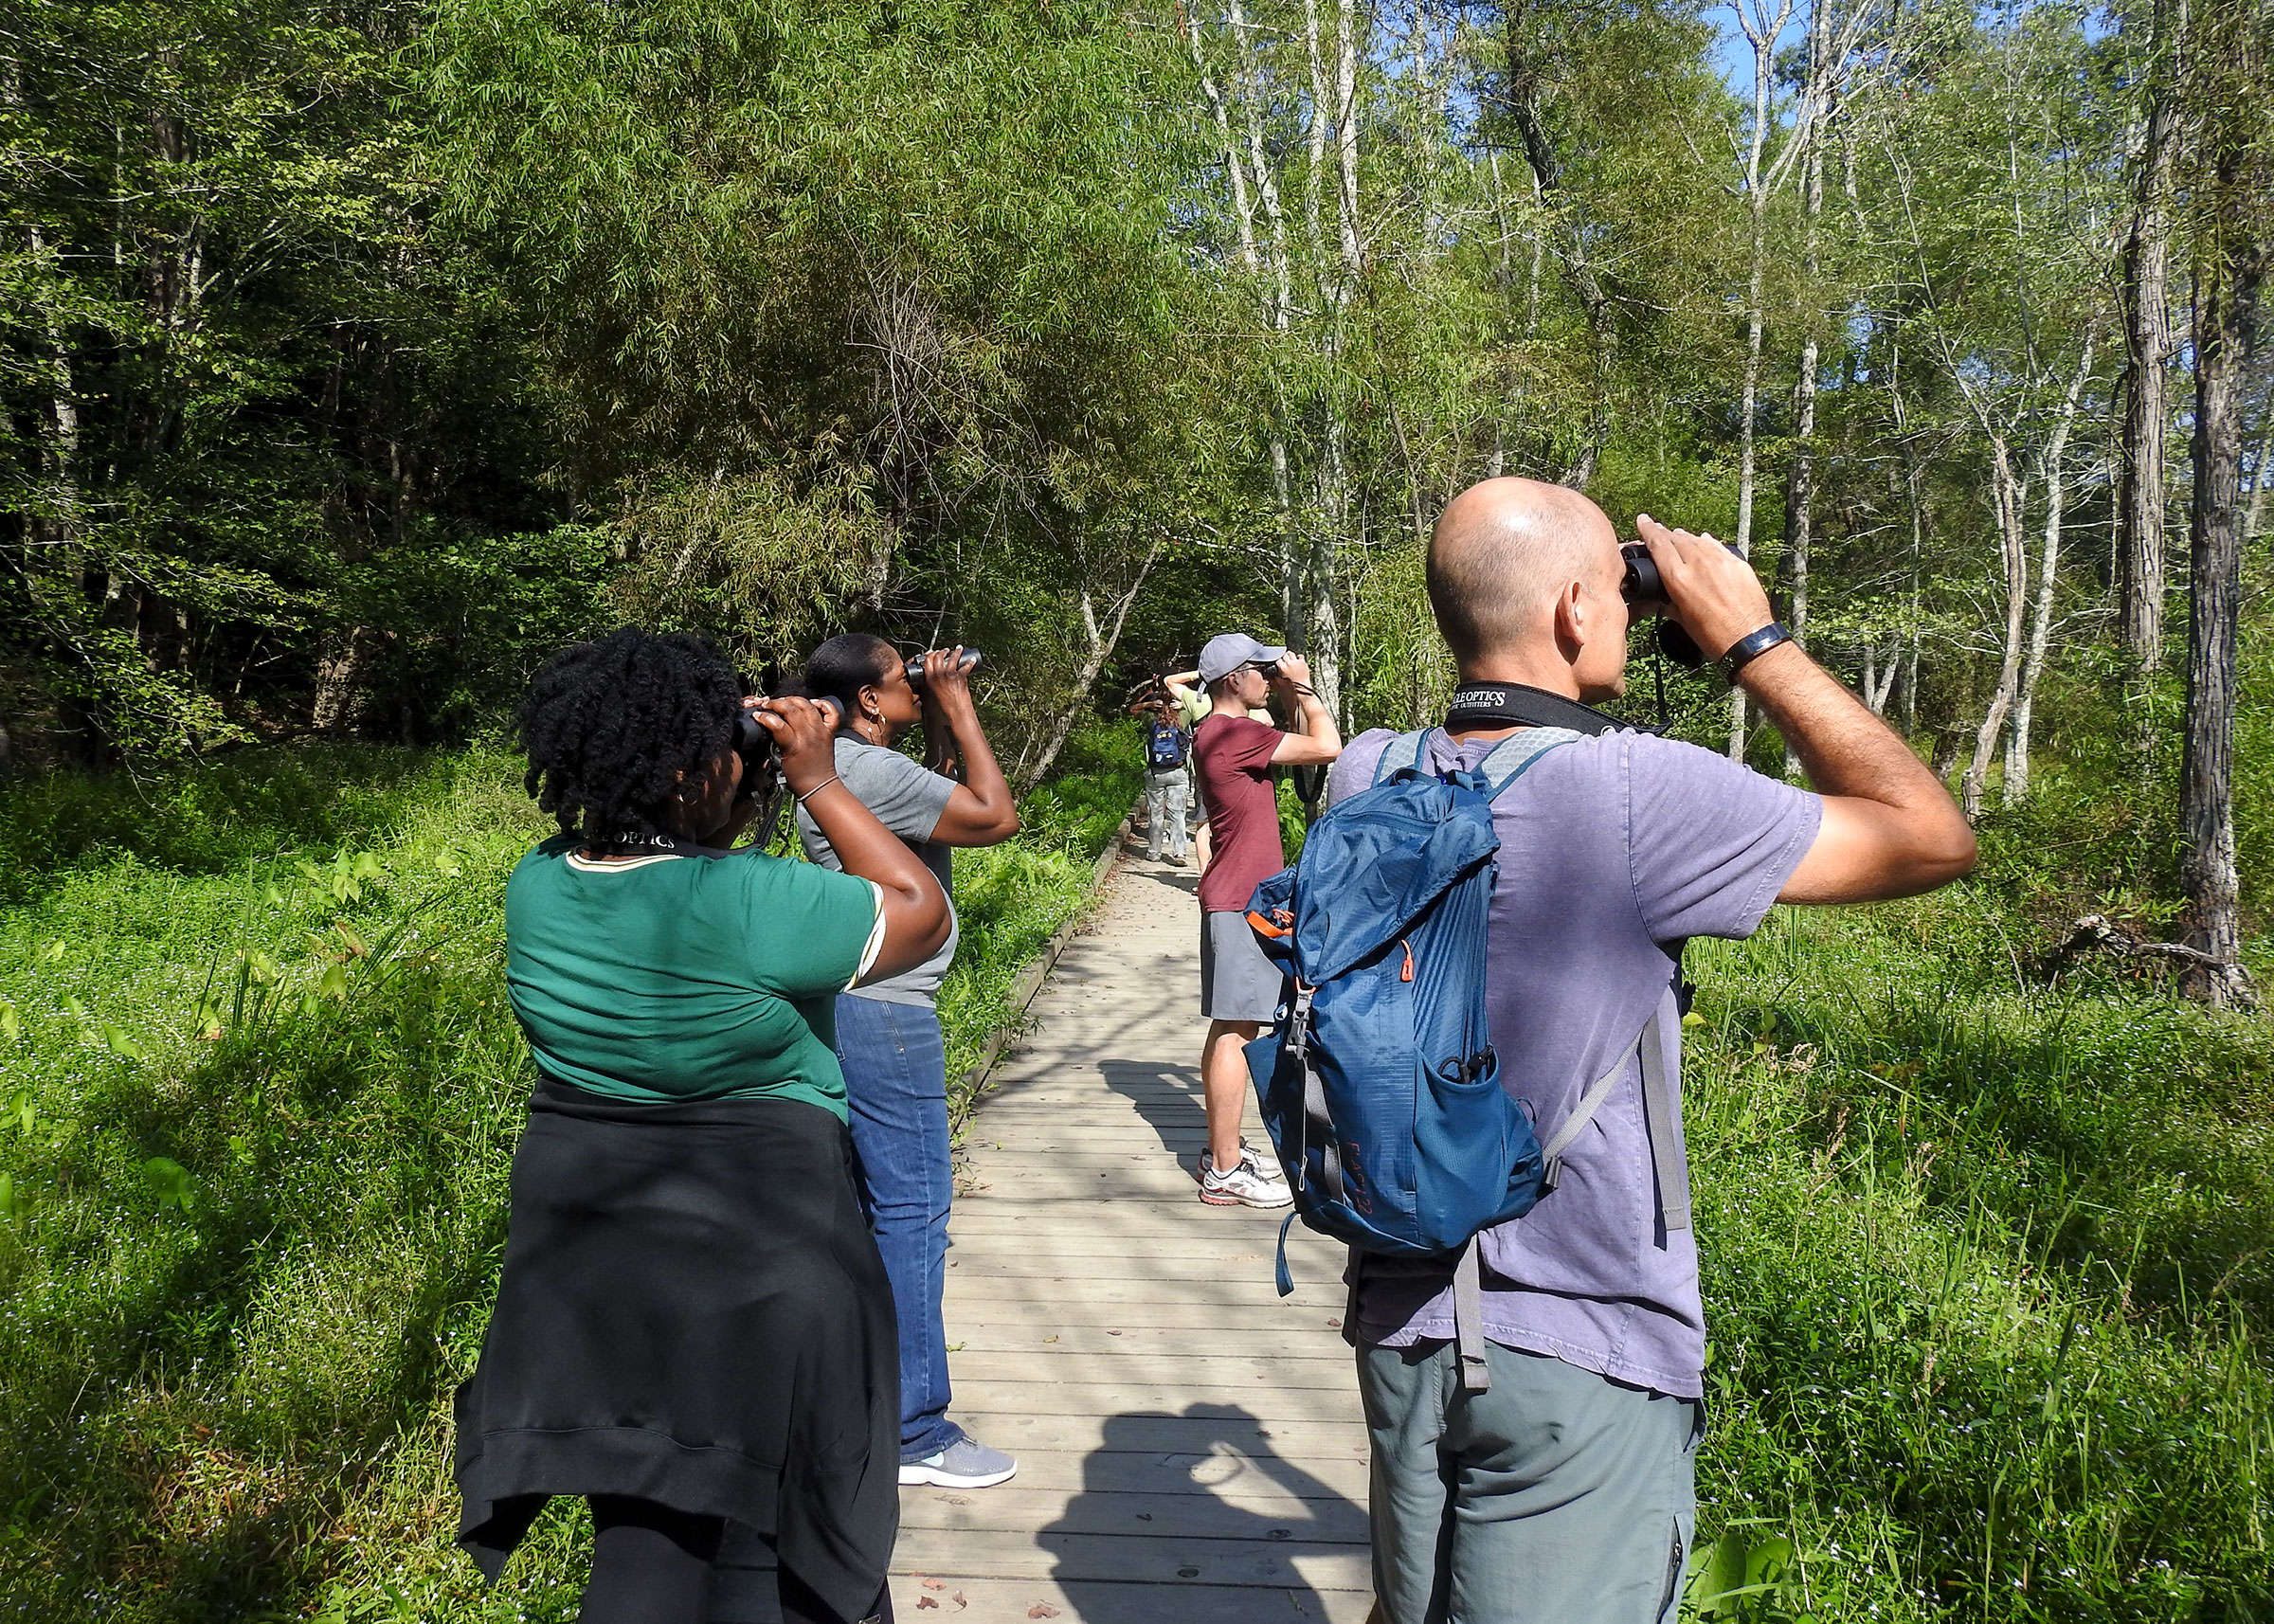 Birding in the Cochran Shoals unit of the Chattahoochee River National Recreation Area in Atlanta. Dottie Head/Georgia Audubon